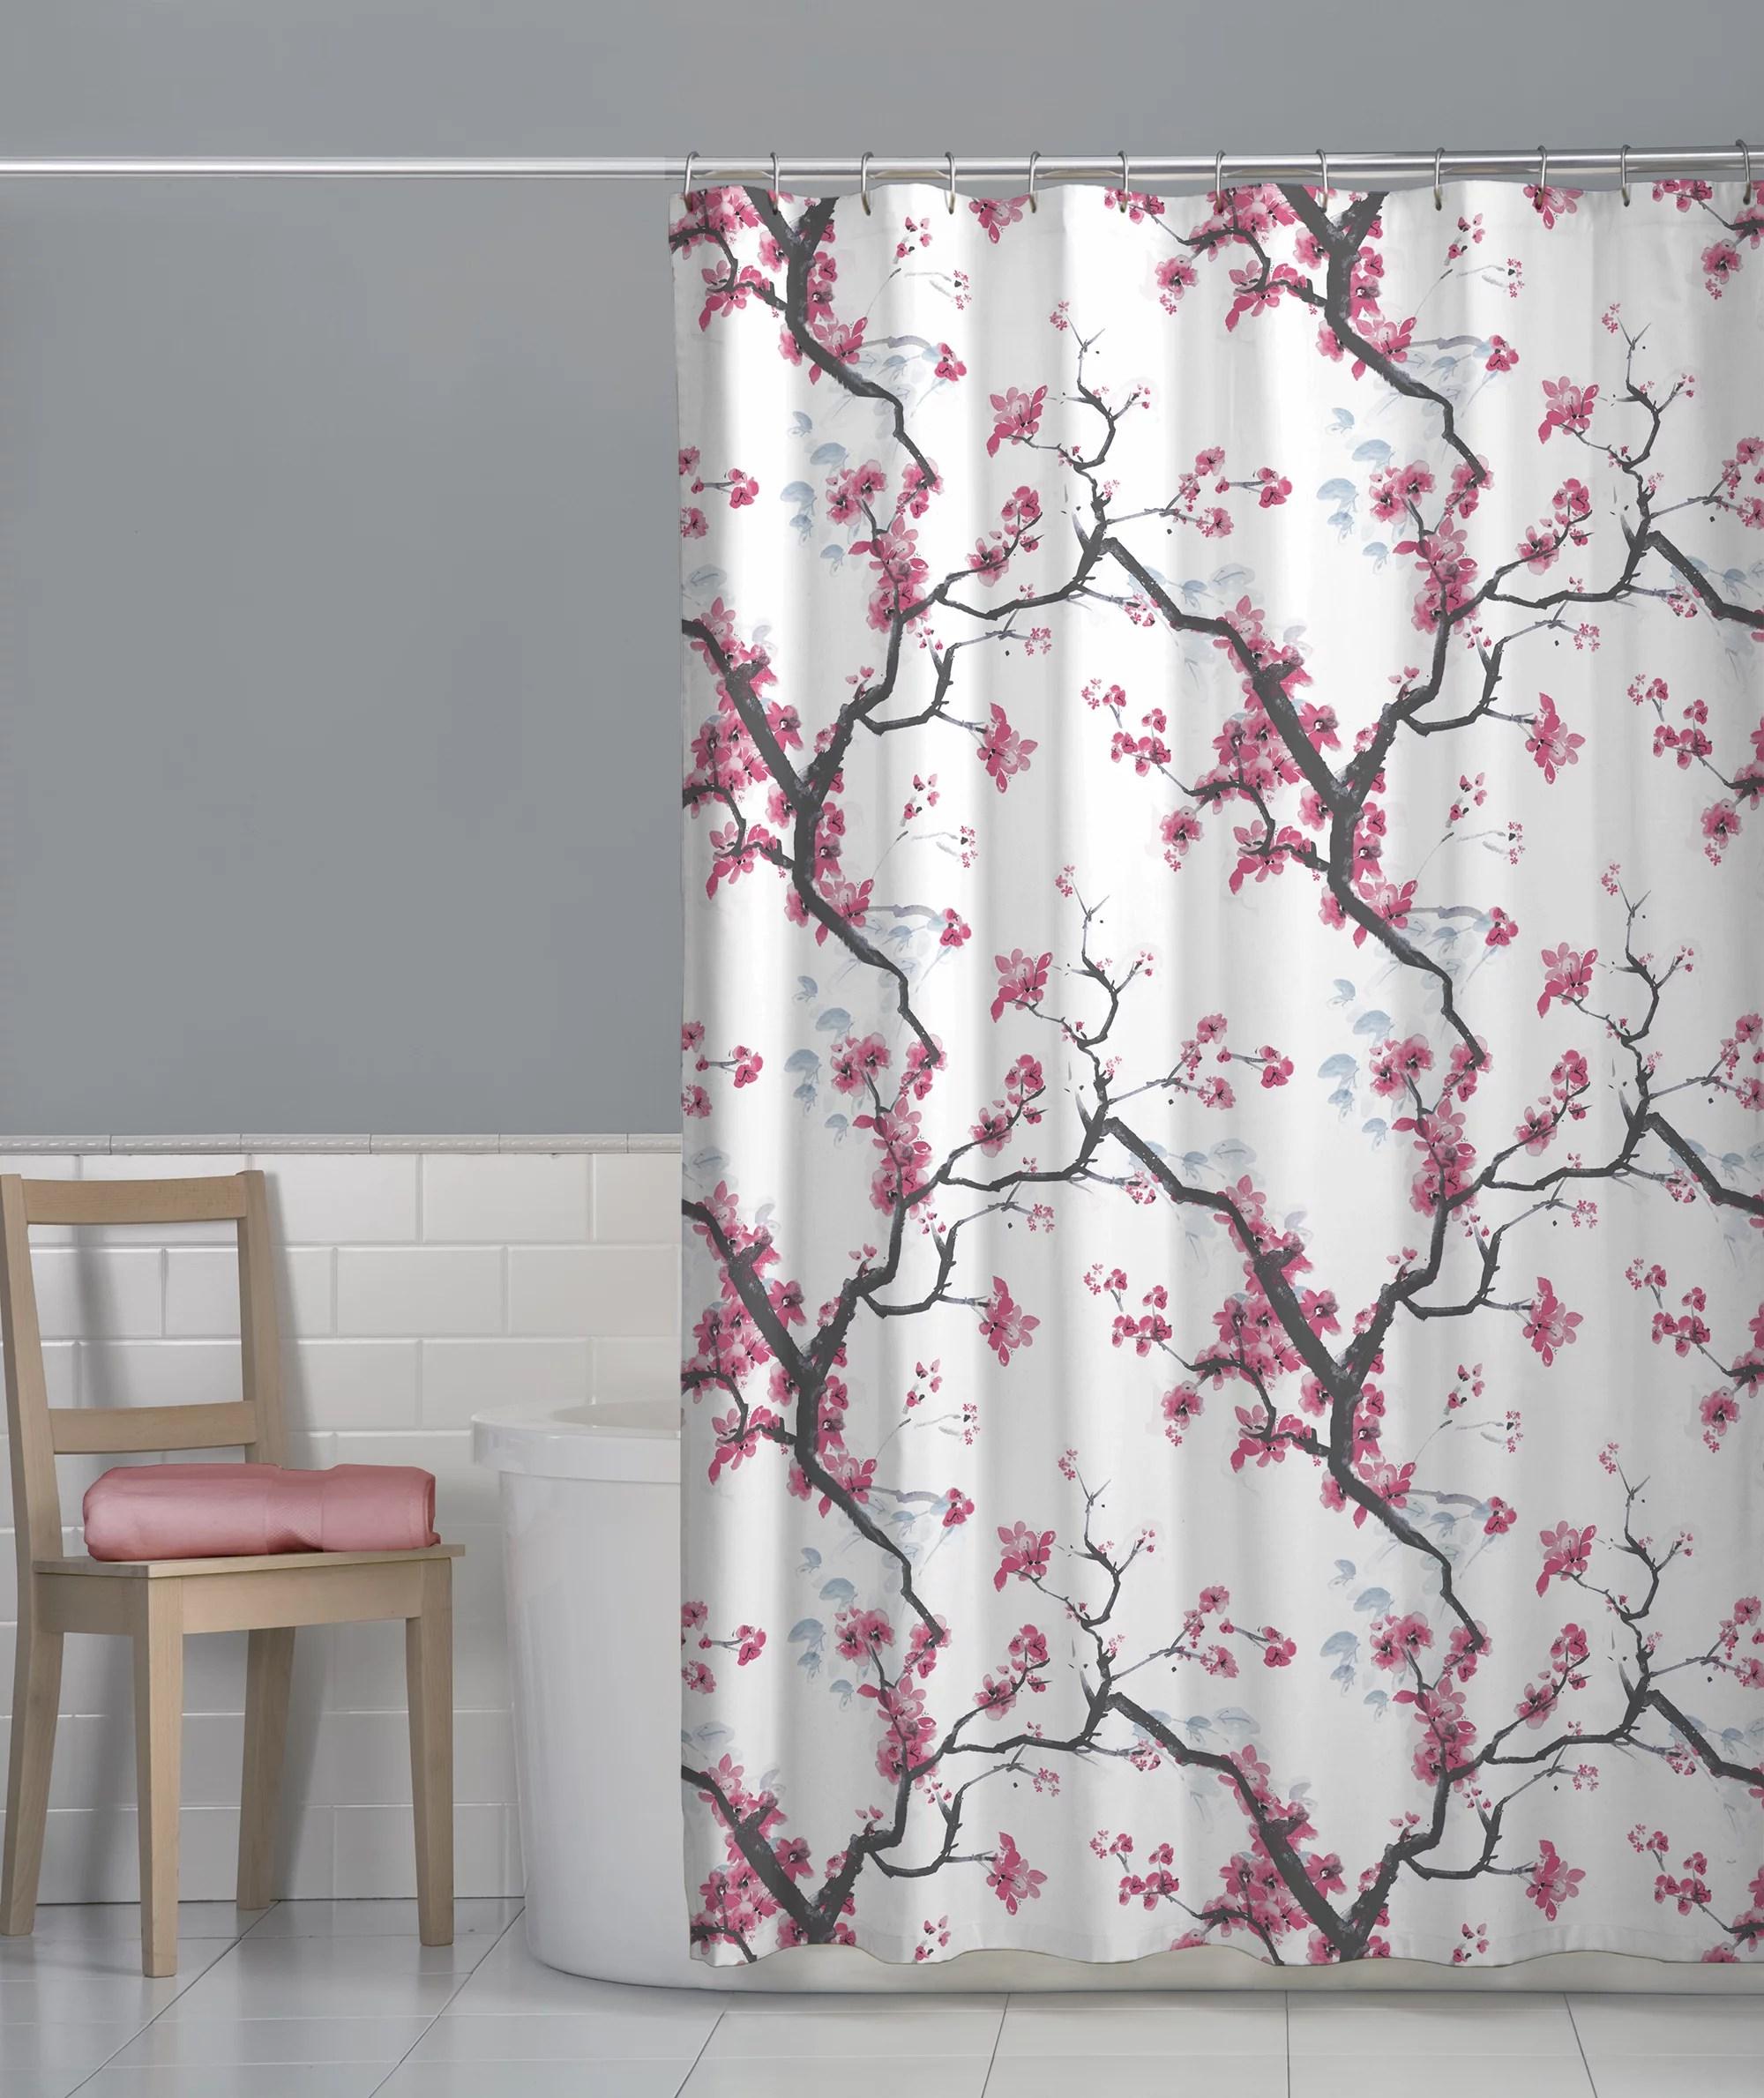 maytex cherry blossom floral fabric shower curtain pink walmart com